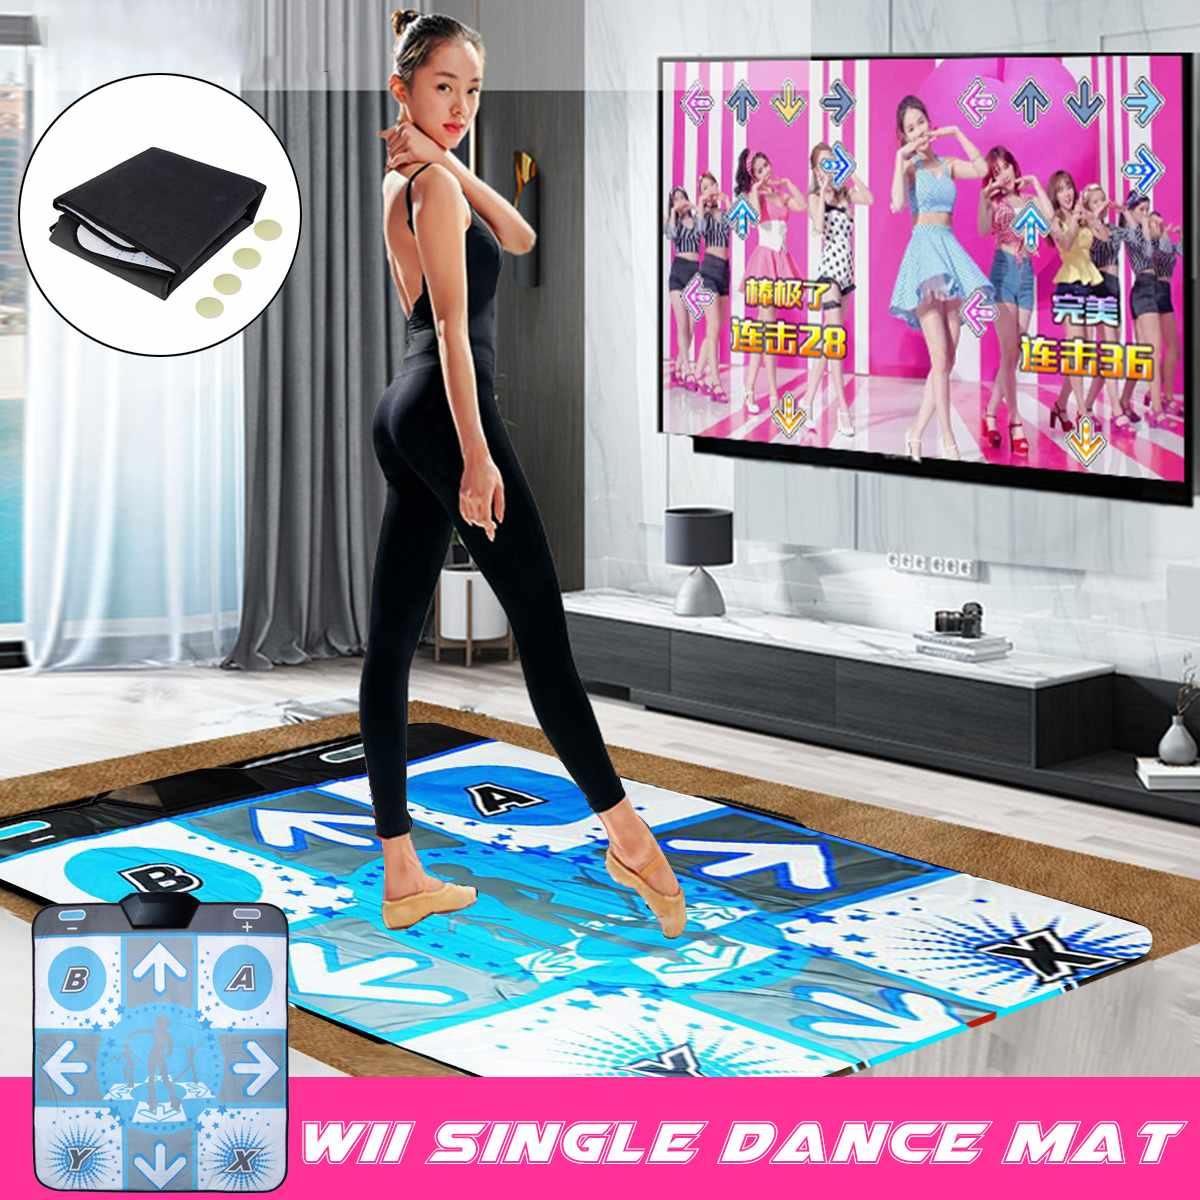 Dance Mat Pad Dancing Step Mats Pad Blanket Non-Slip Foot Print Mat for PC TV - ANKUX Tech Co., Ltd